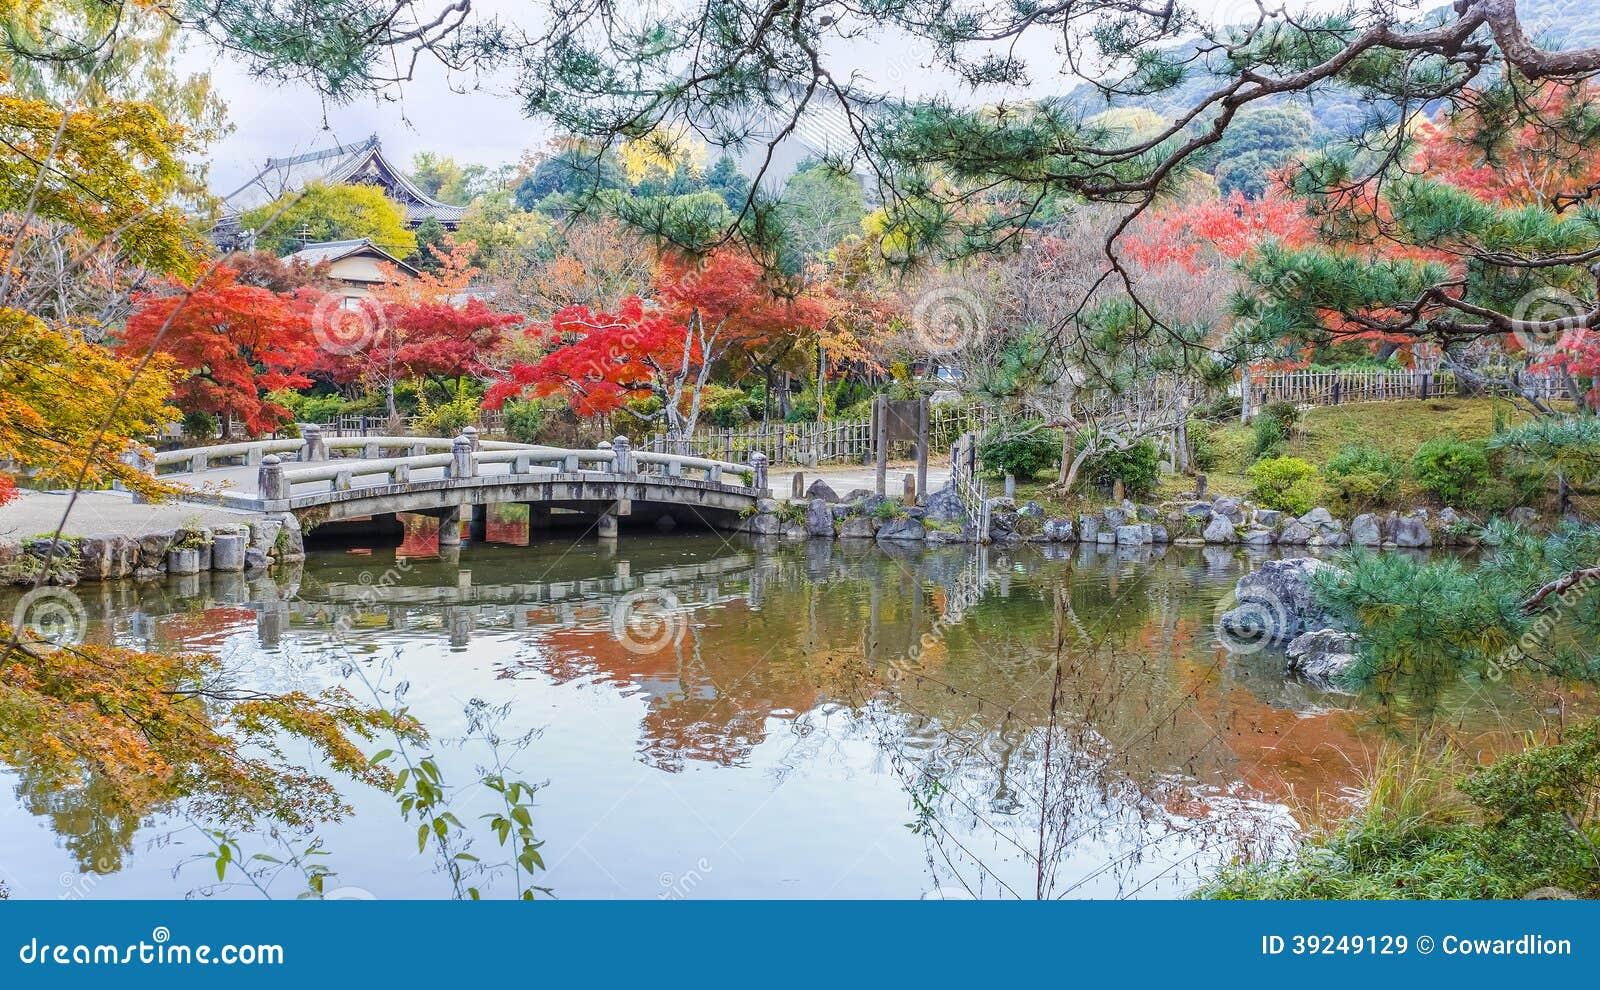 Maruyama Koen (Maruyama Park) In Autumn, In Kyoto Stock Photo - Image: 39249129